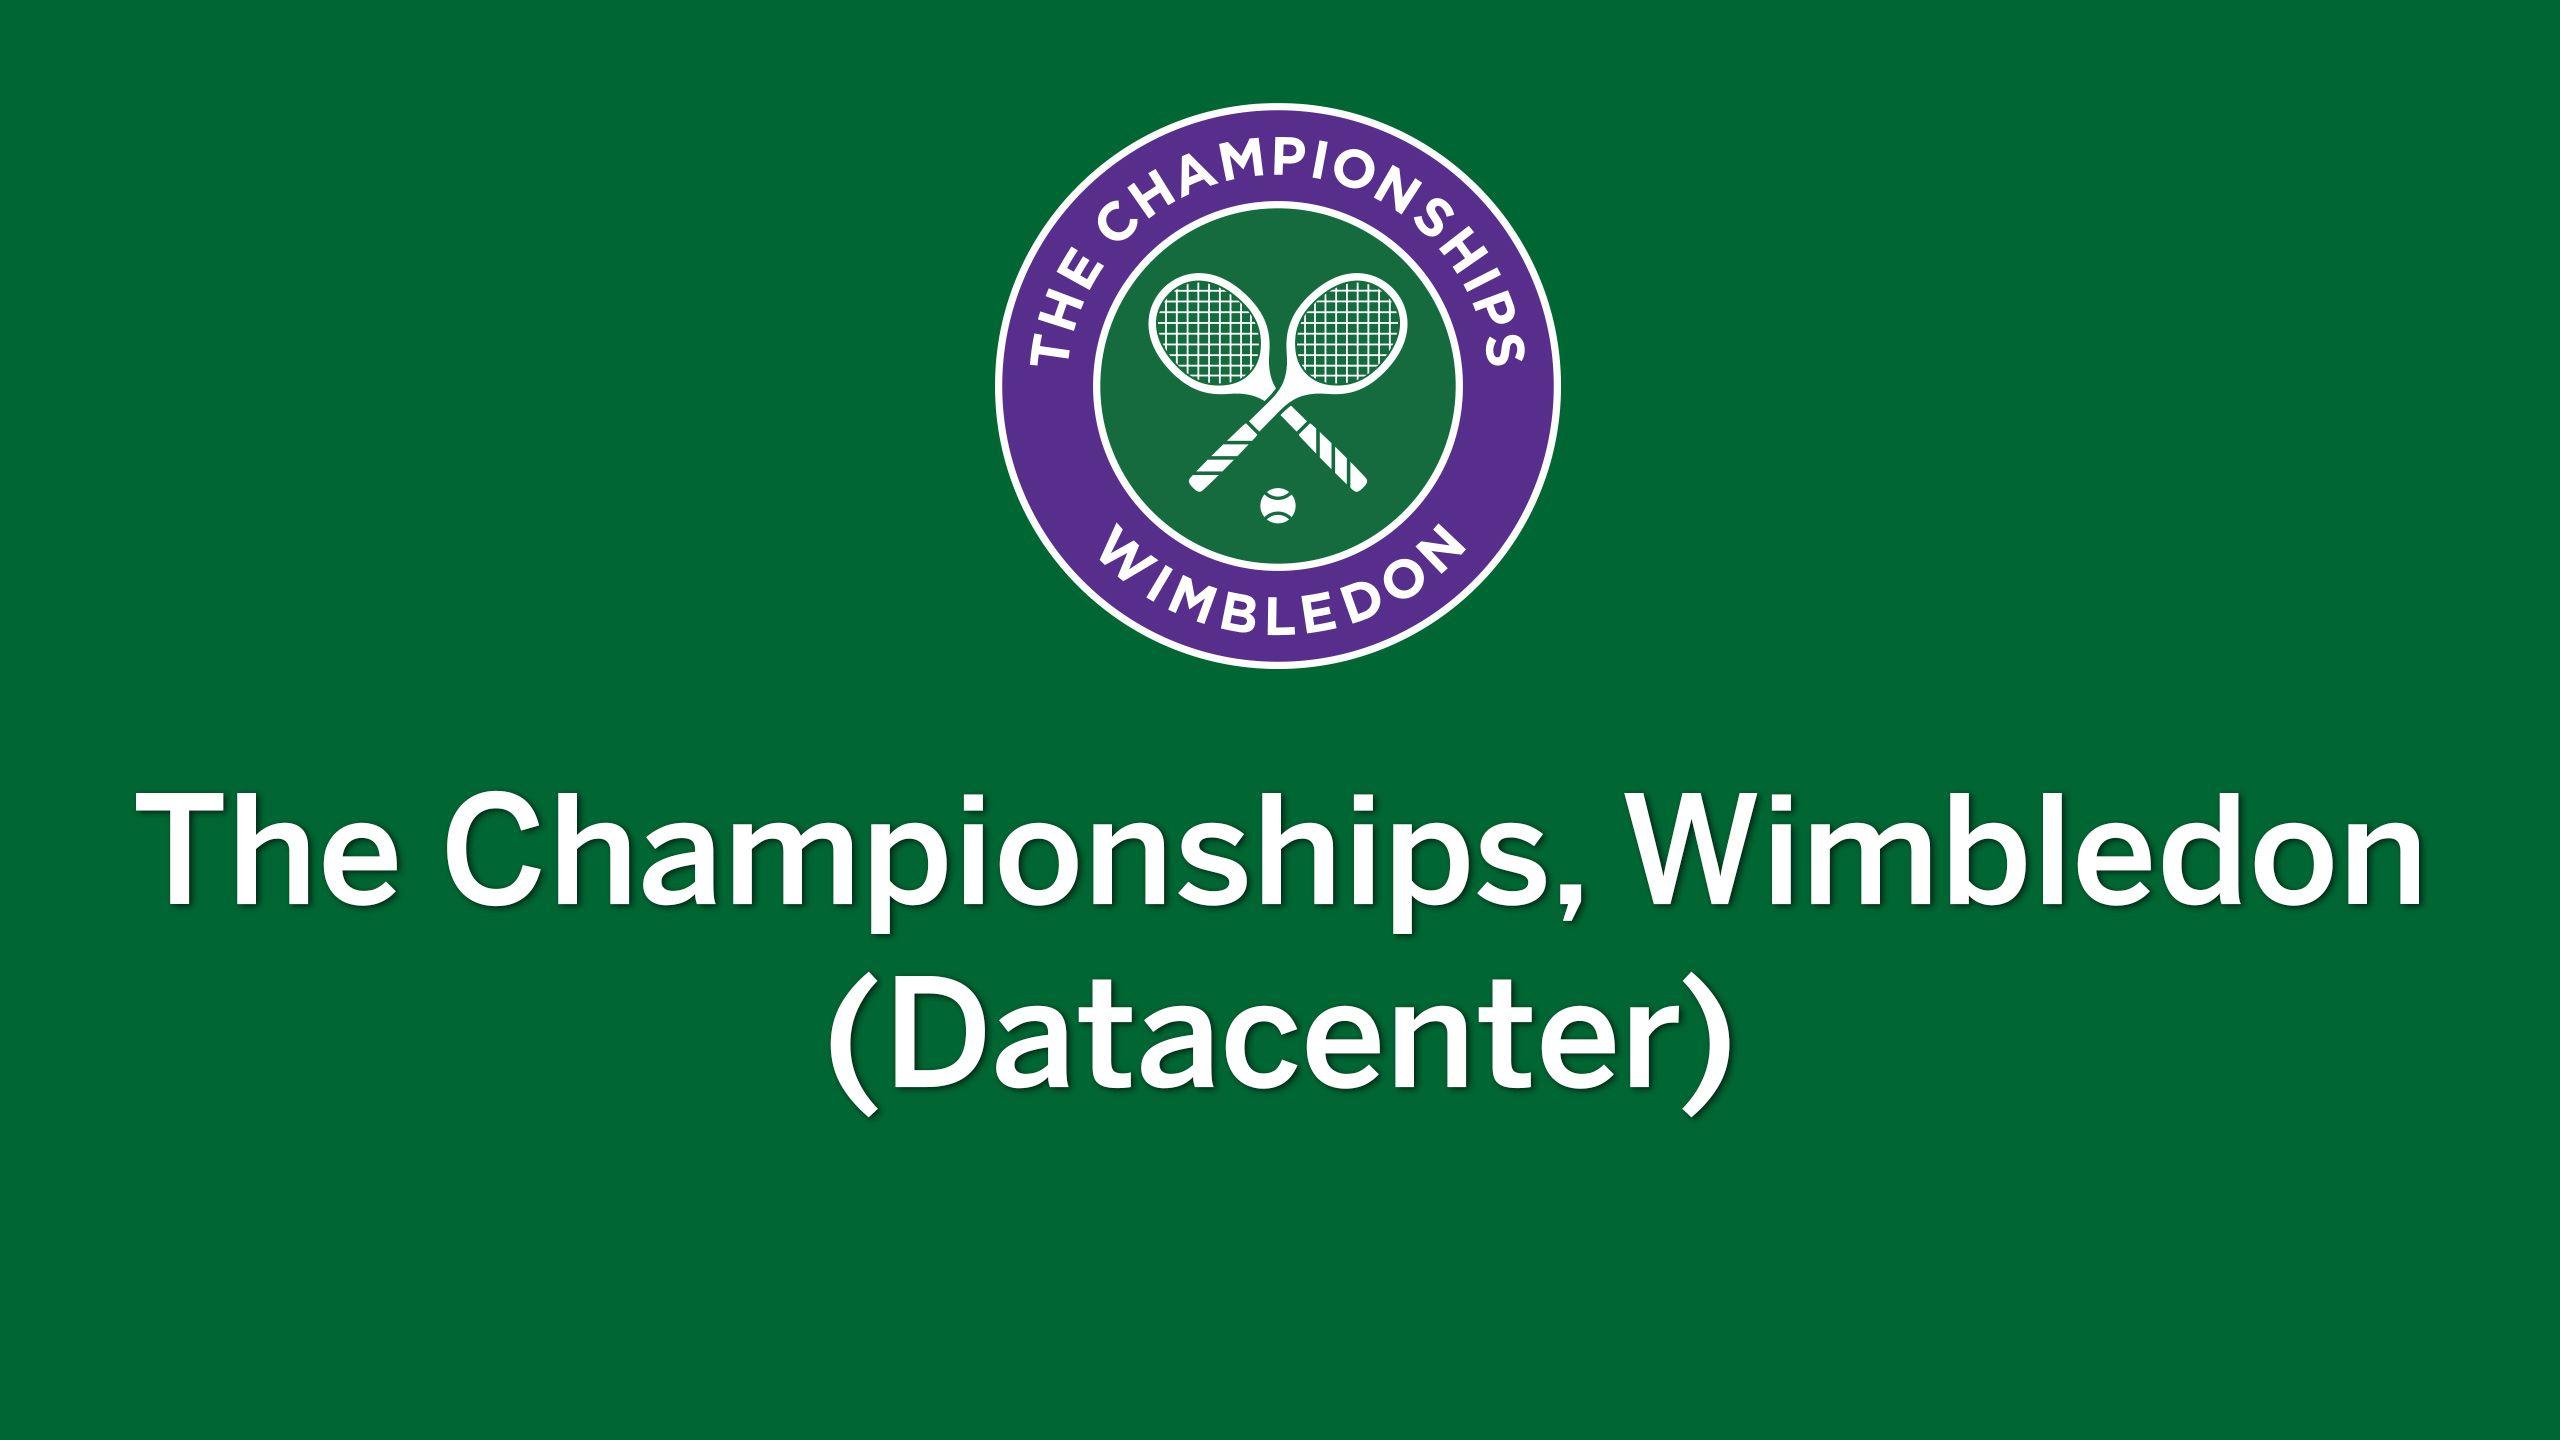 Wimbledon Datacenter (Ladies' Championship)